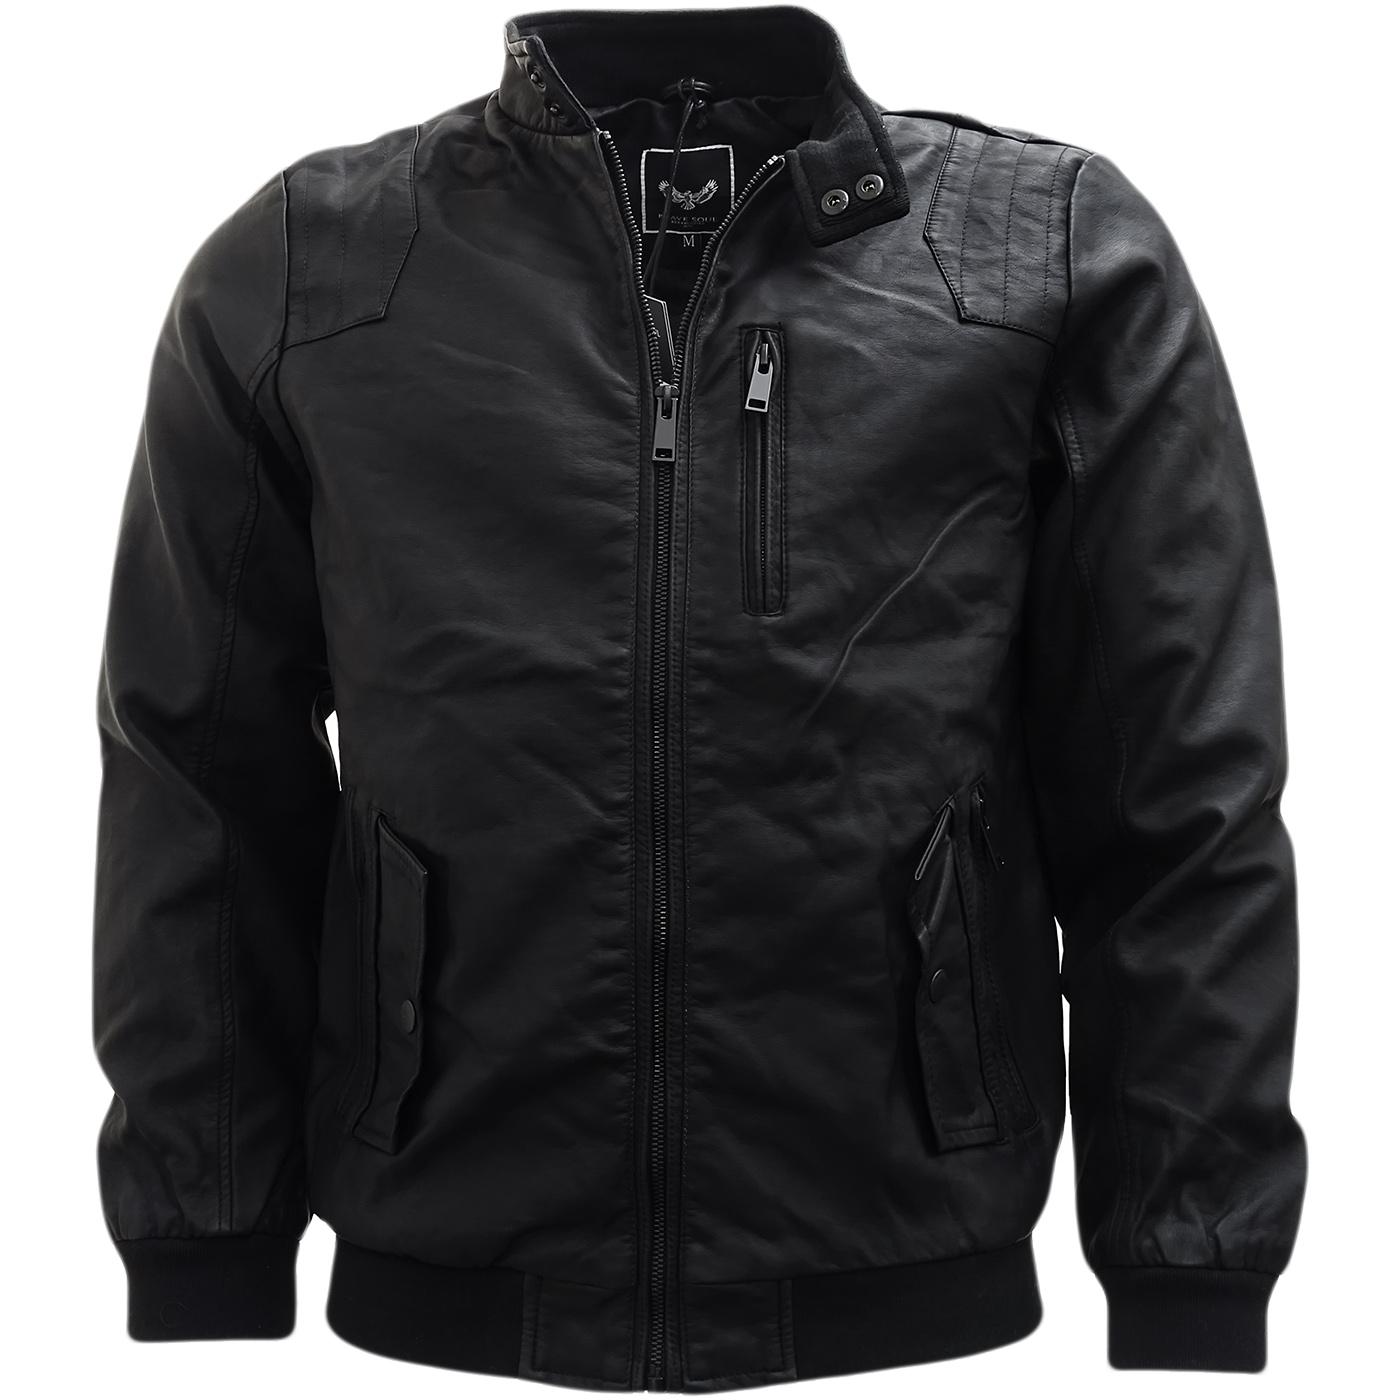 Brave Soul Black Leather Look Jacket / Outerwear Coat